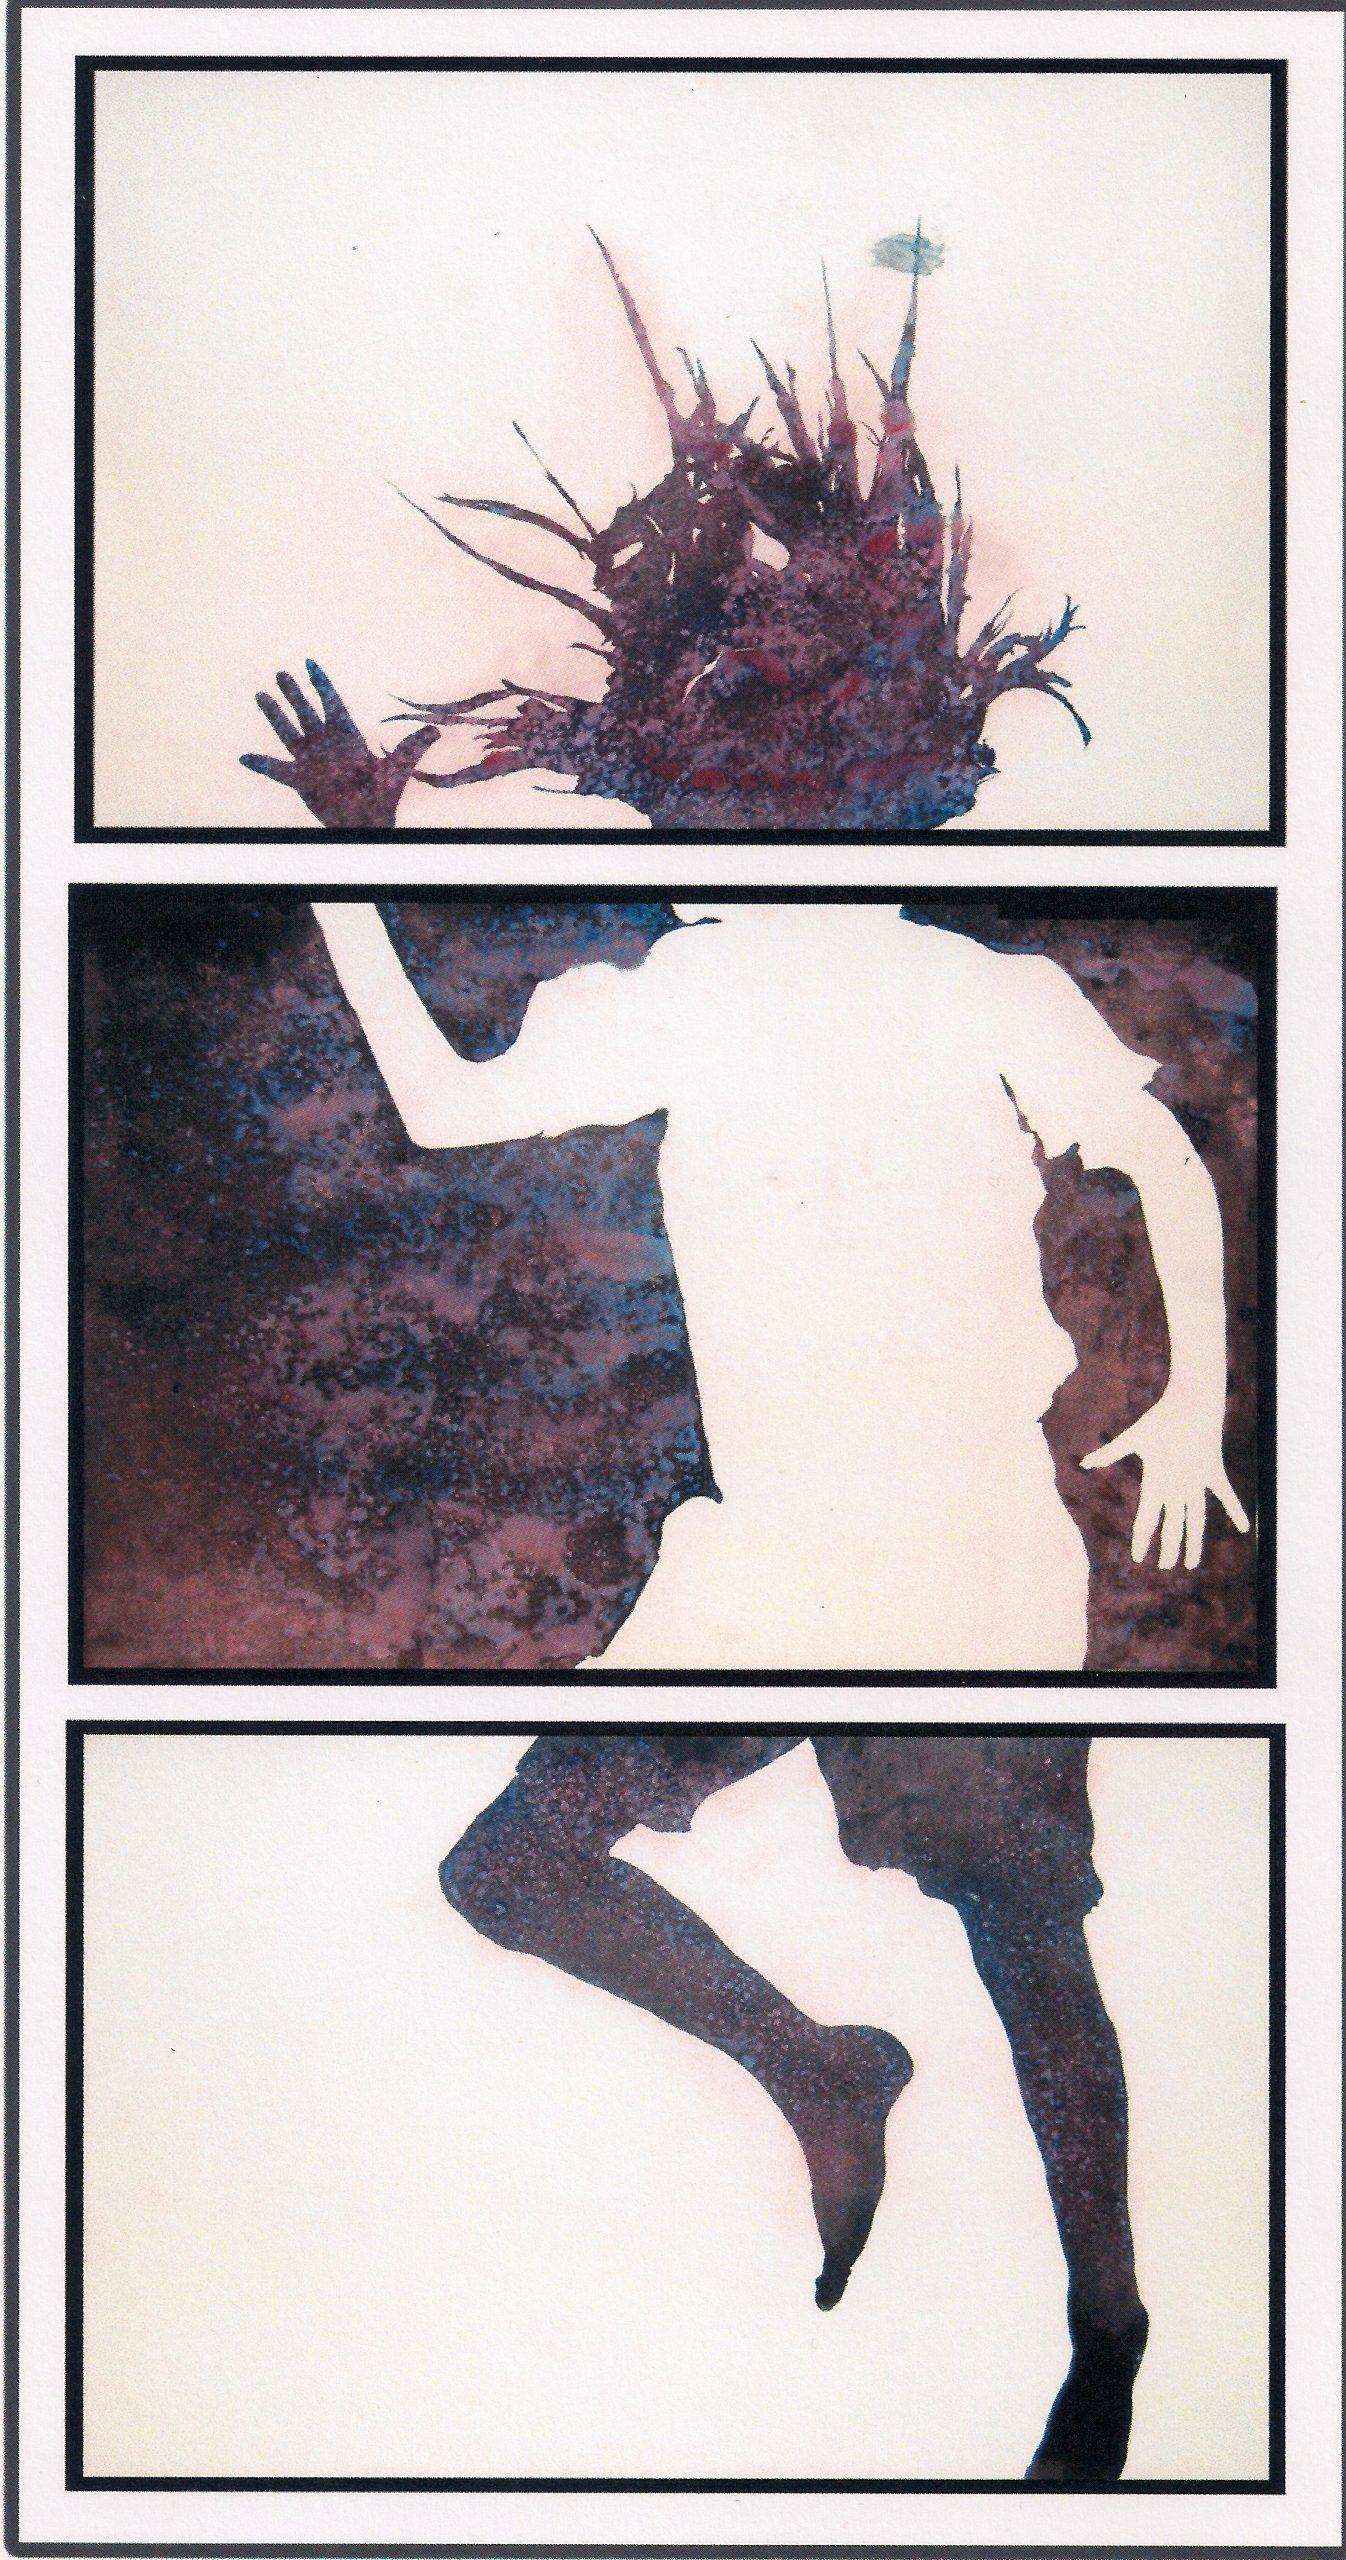 """Wild Child"" -painting by Michael Prestgard-Duke"